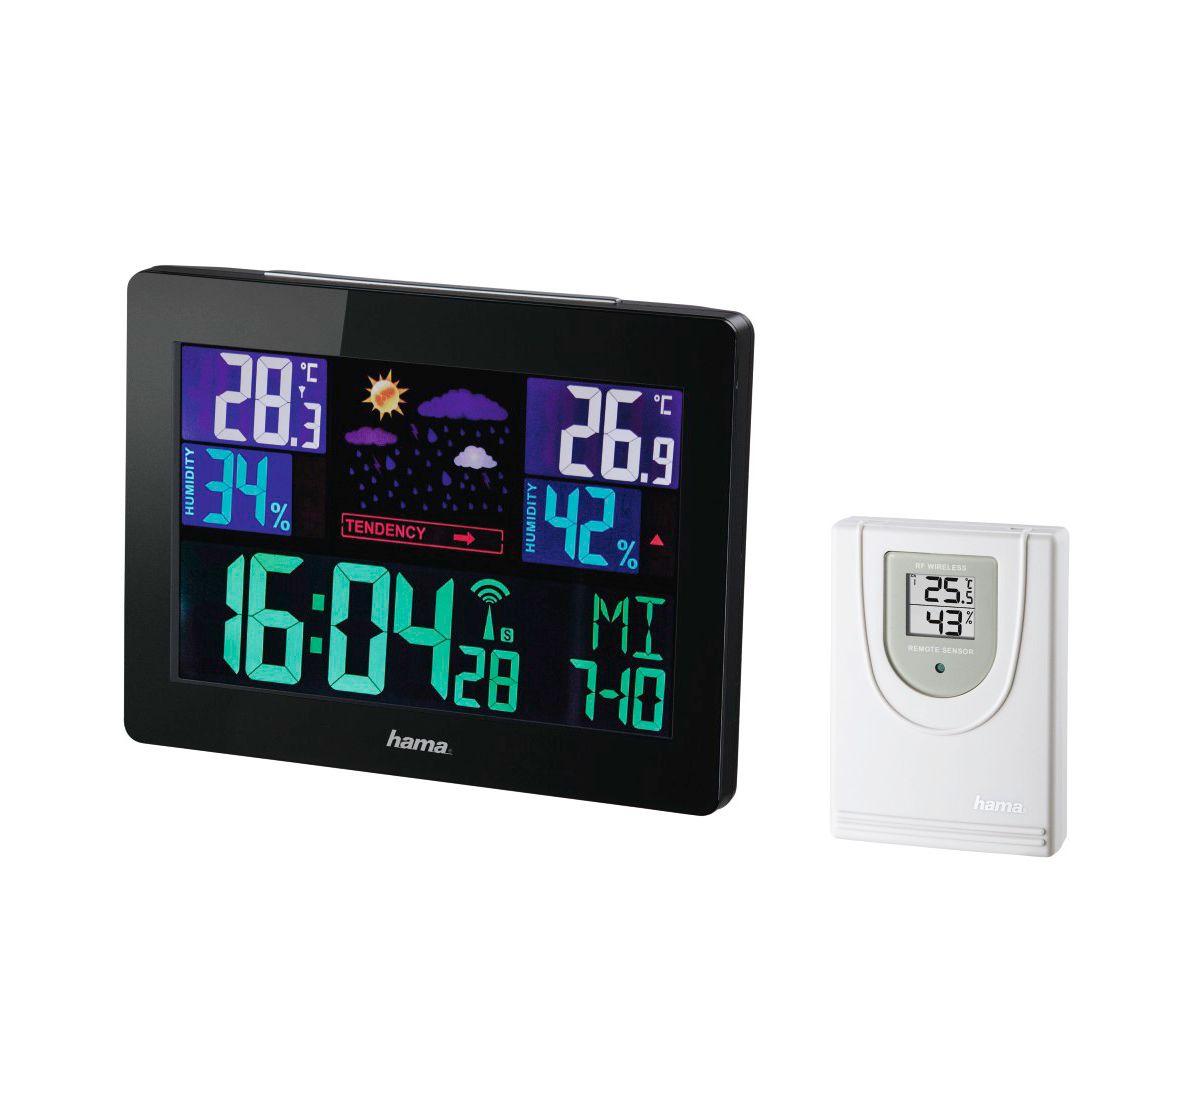 Hama Funk Wetterstation Hygrometer Barometer Th...